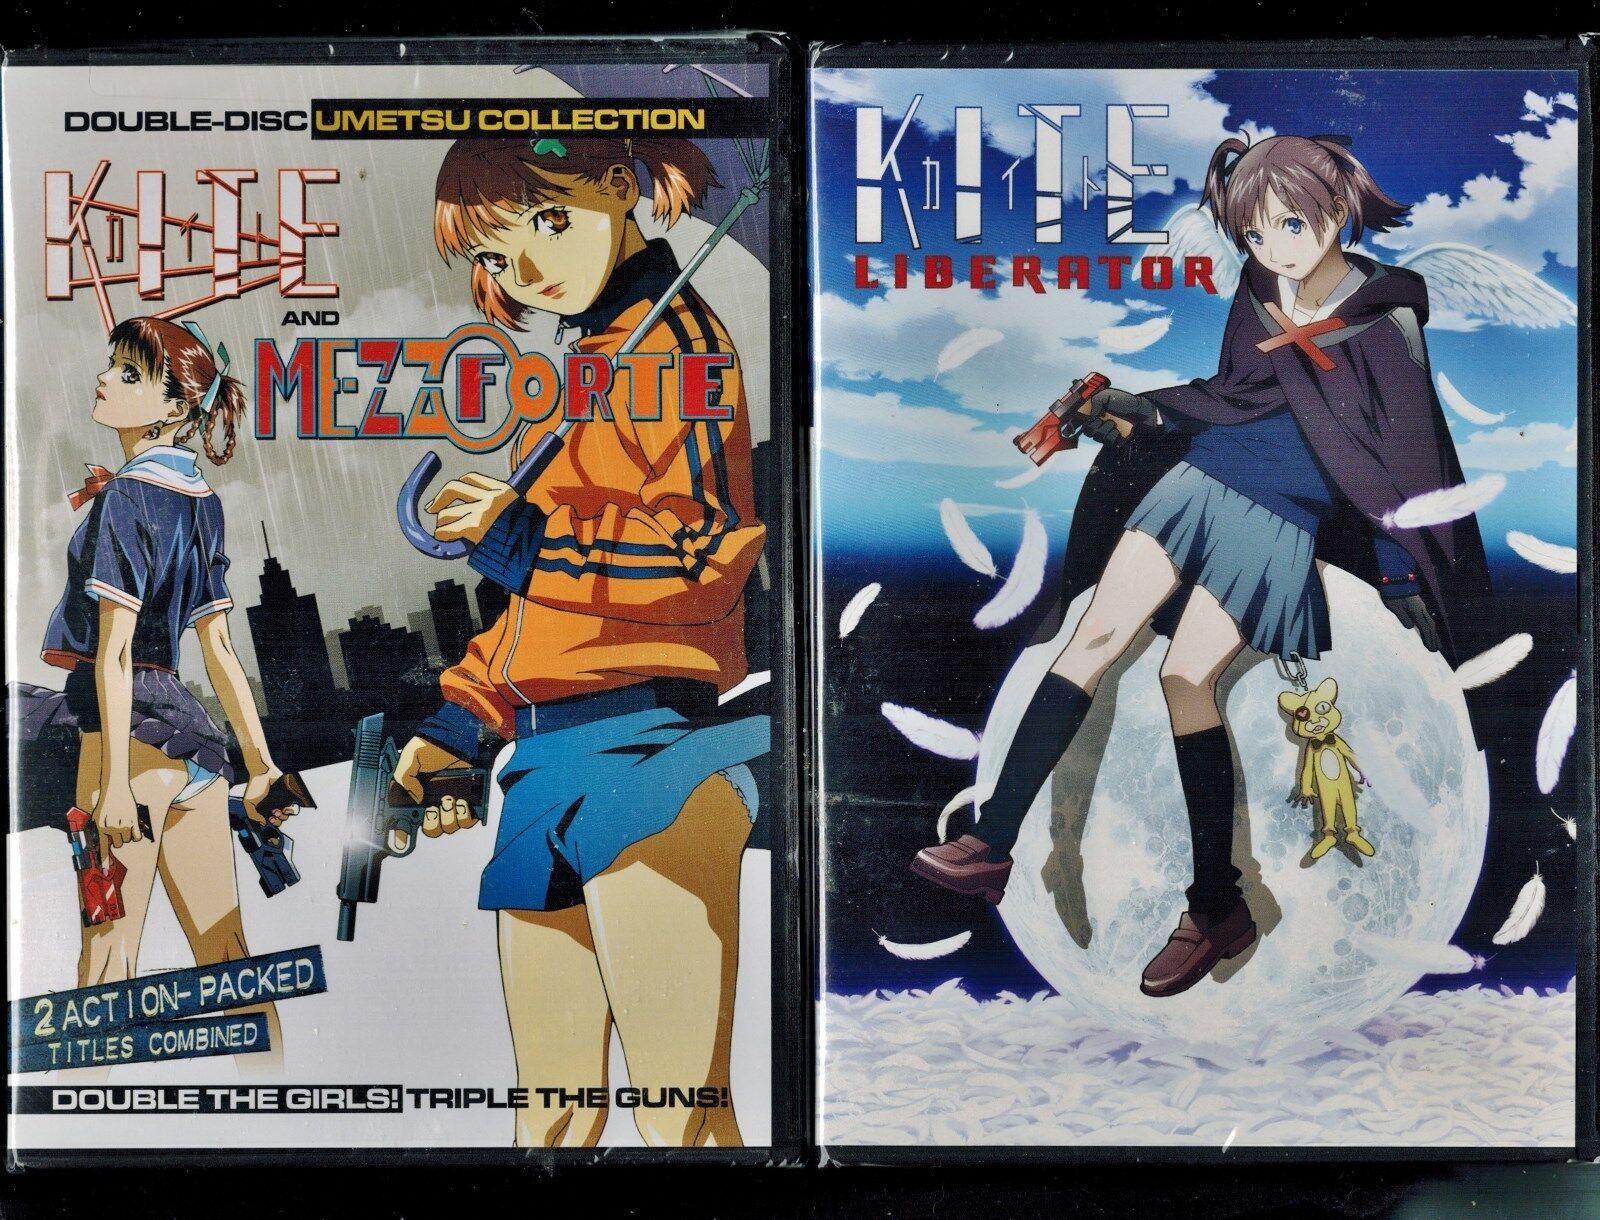 Kite + Kite Liberator + Mezzo Forte